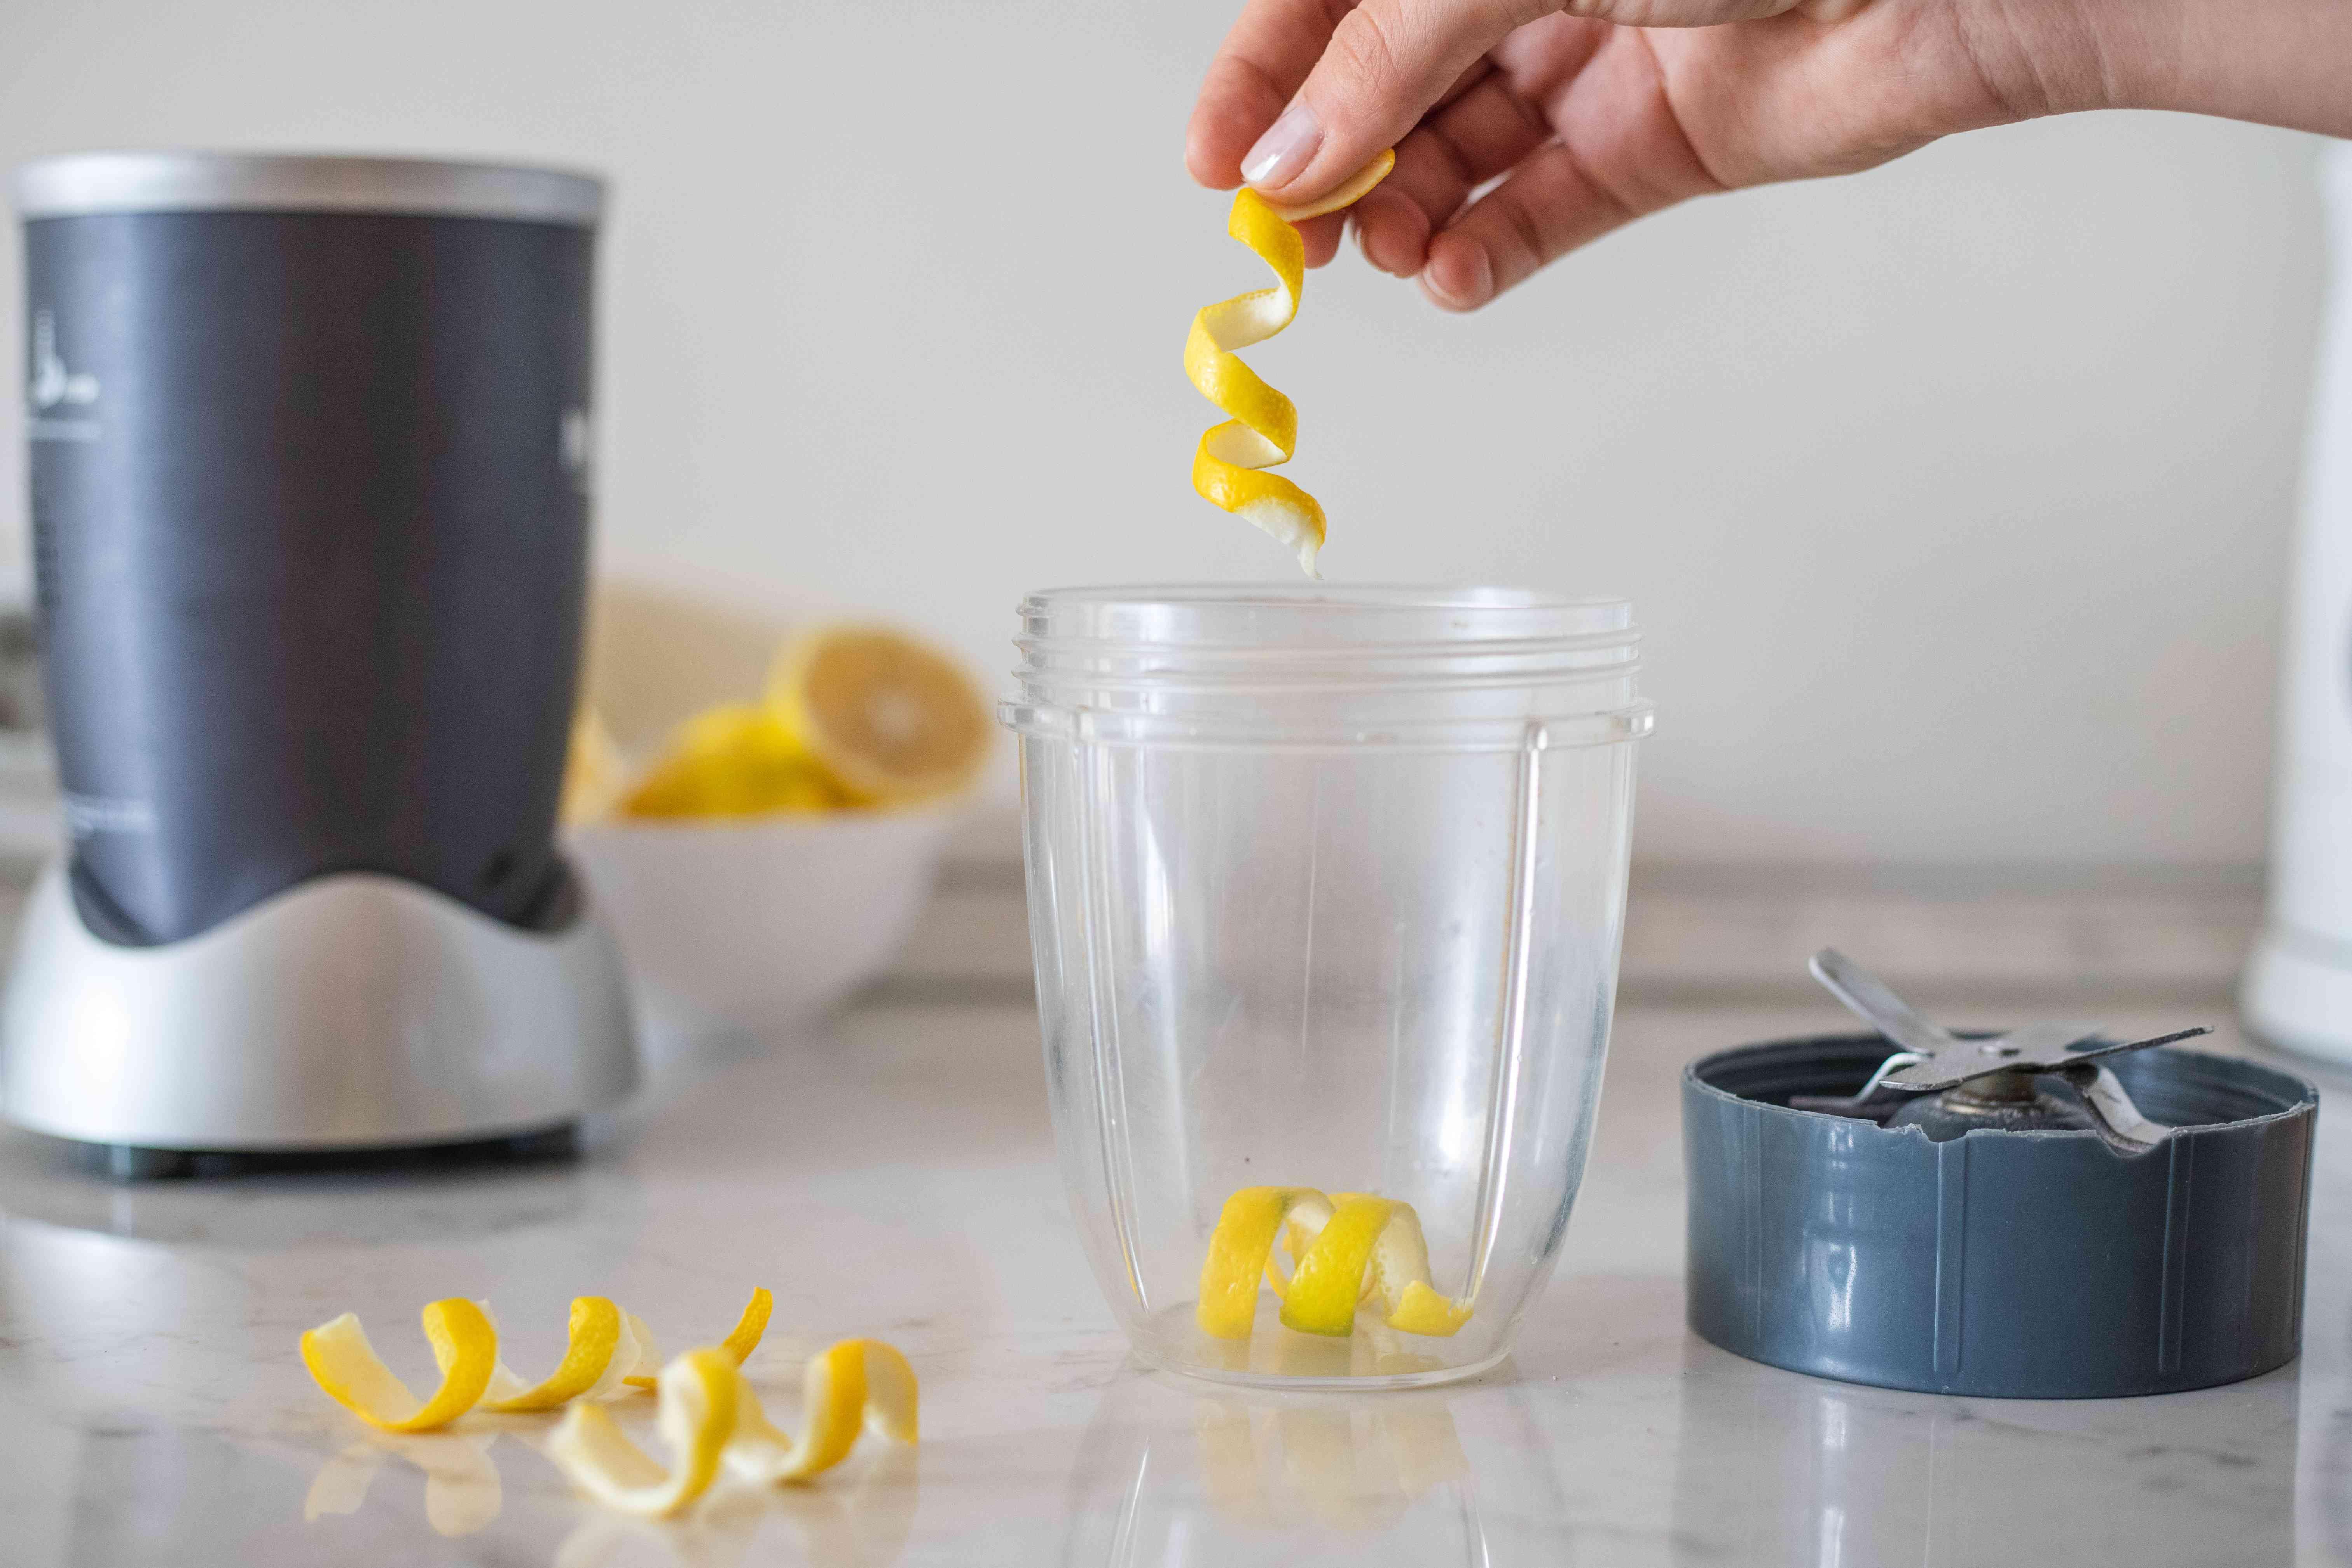 hand drops lemon peel into small blender to pulverize into citrus zest